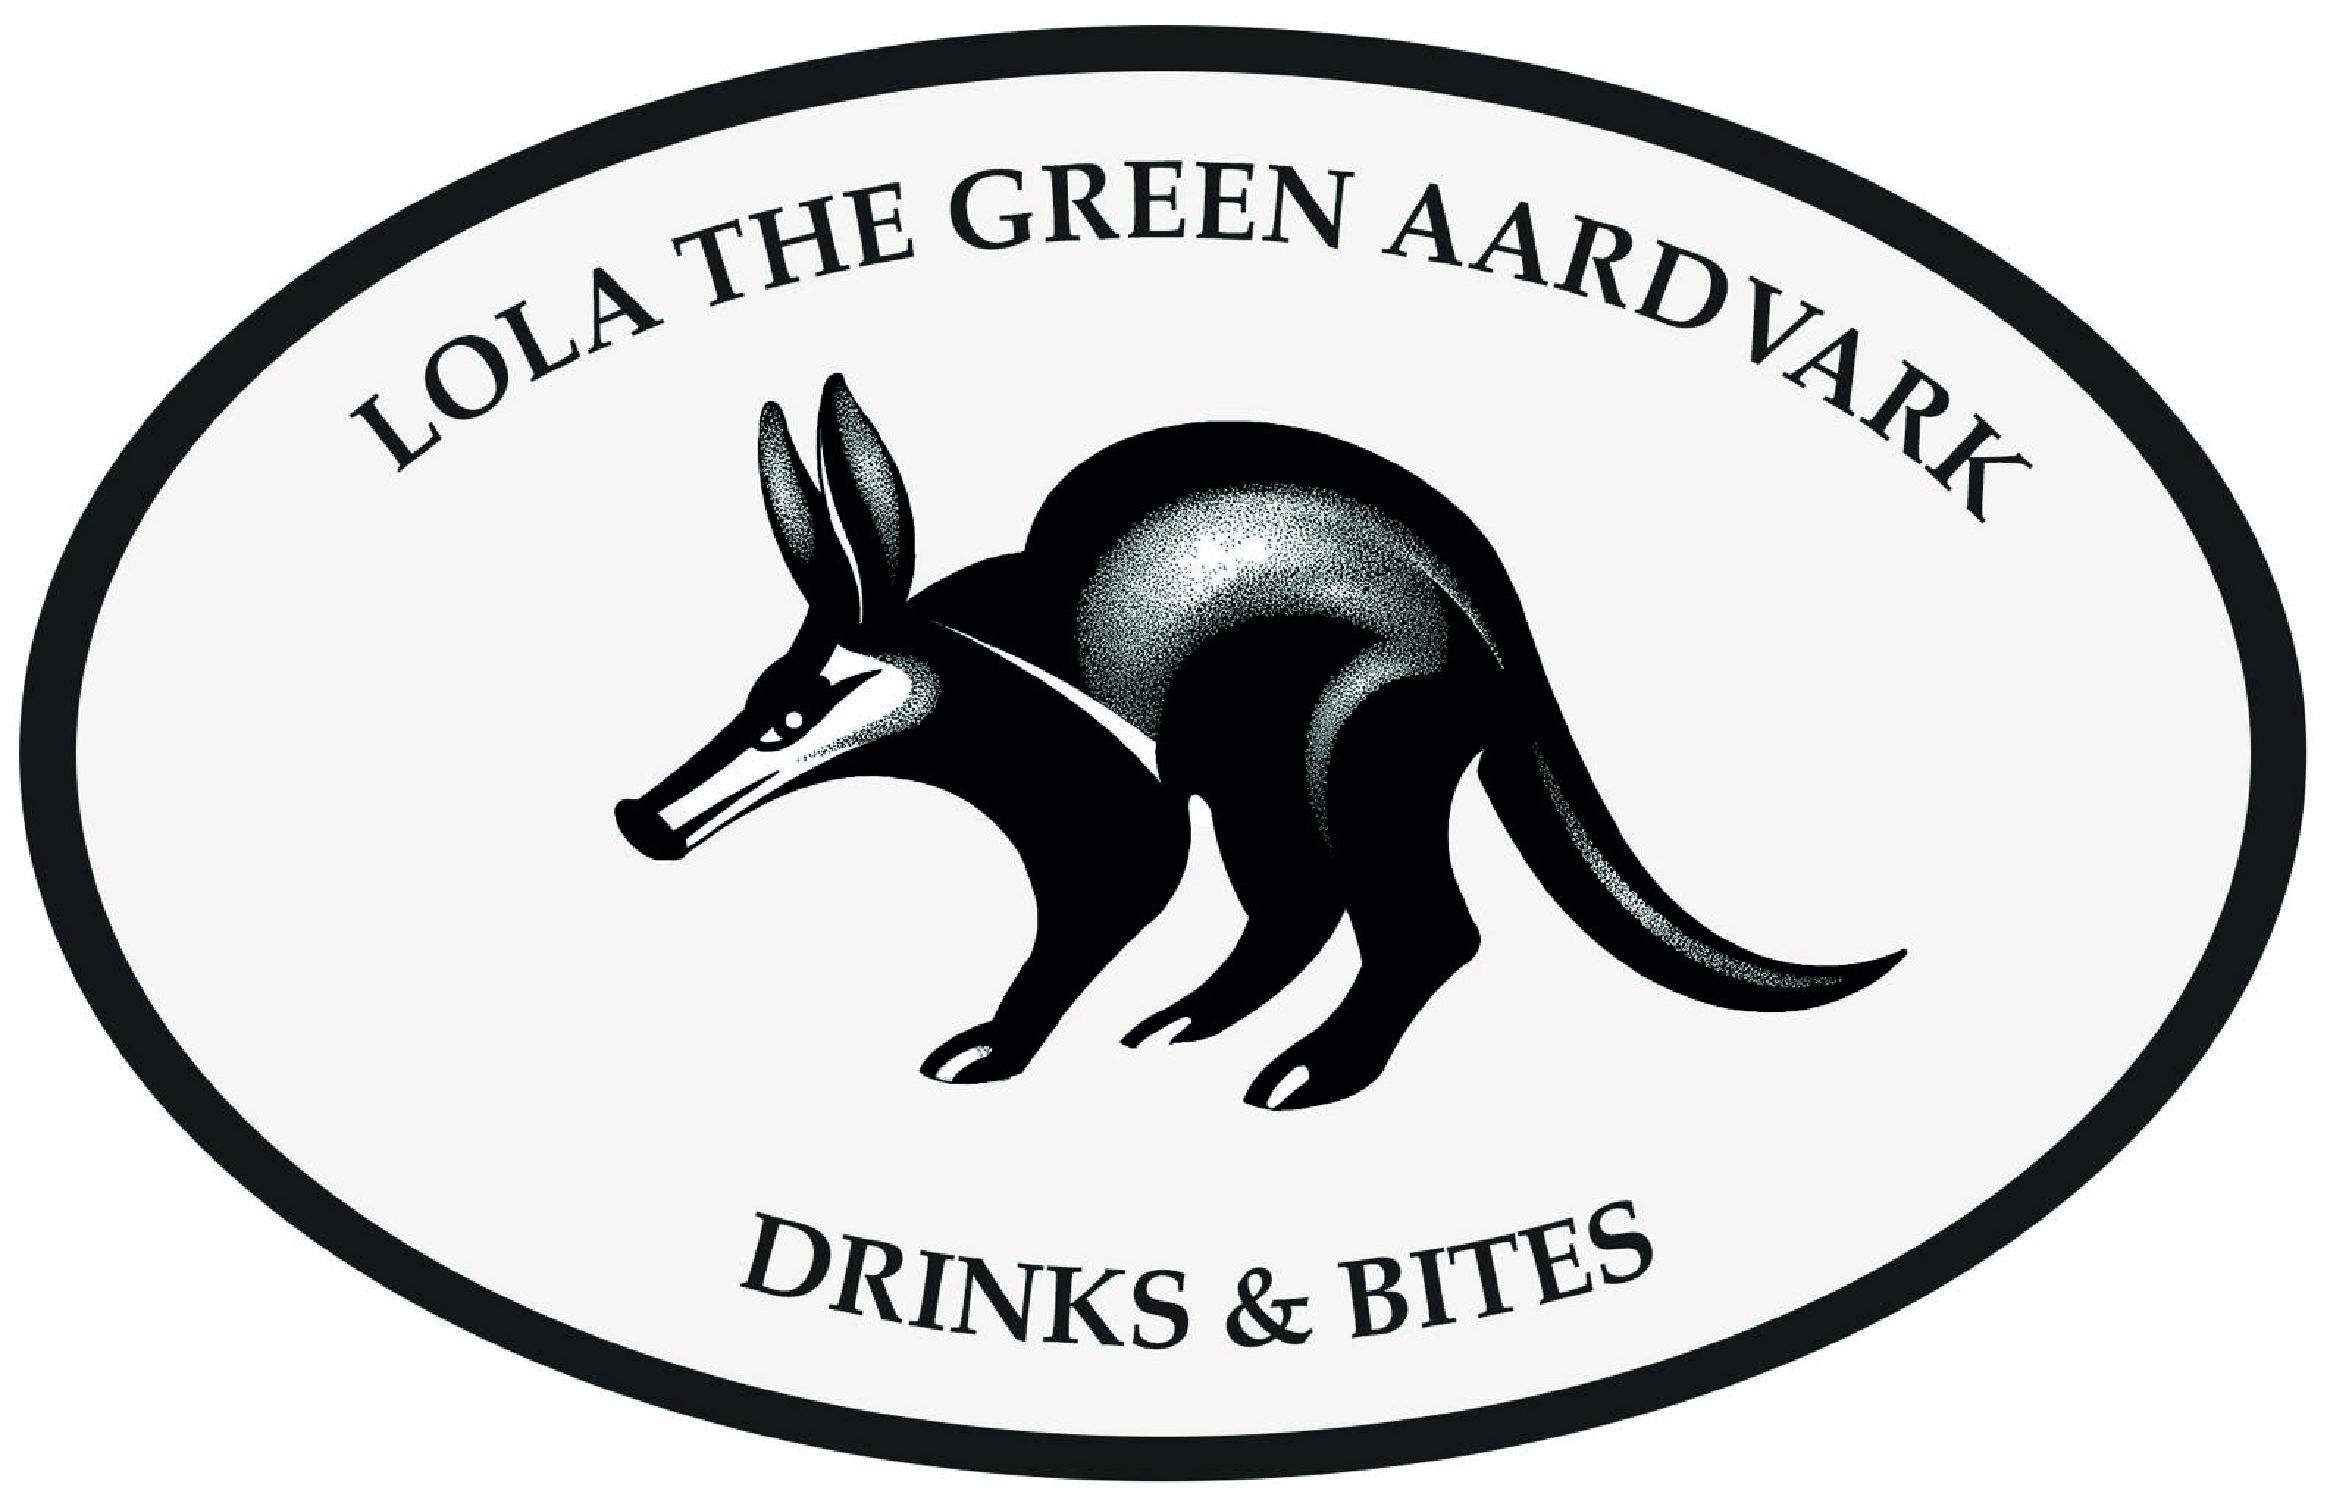 Lola The Green Aardvark